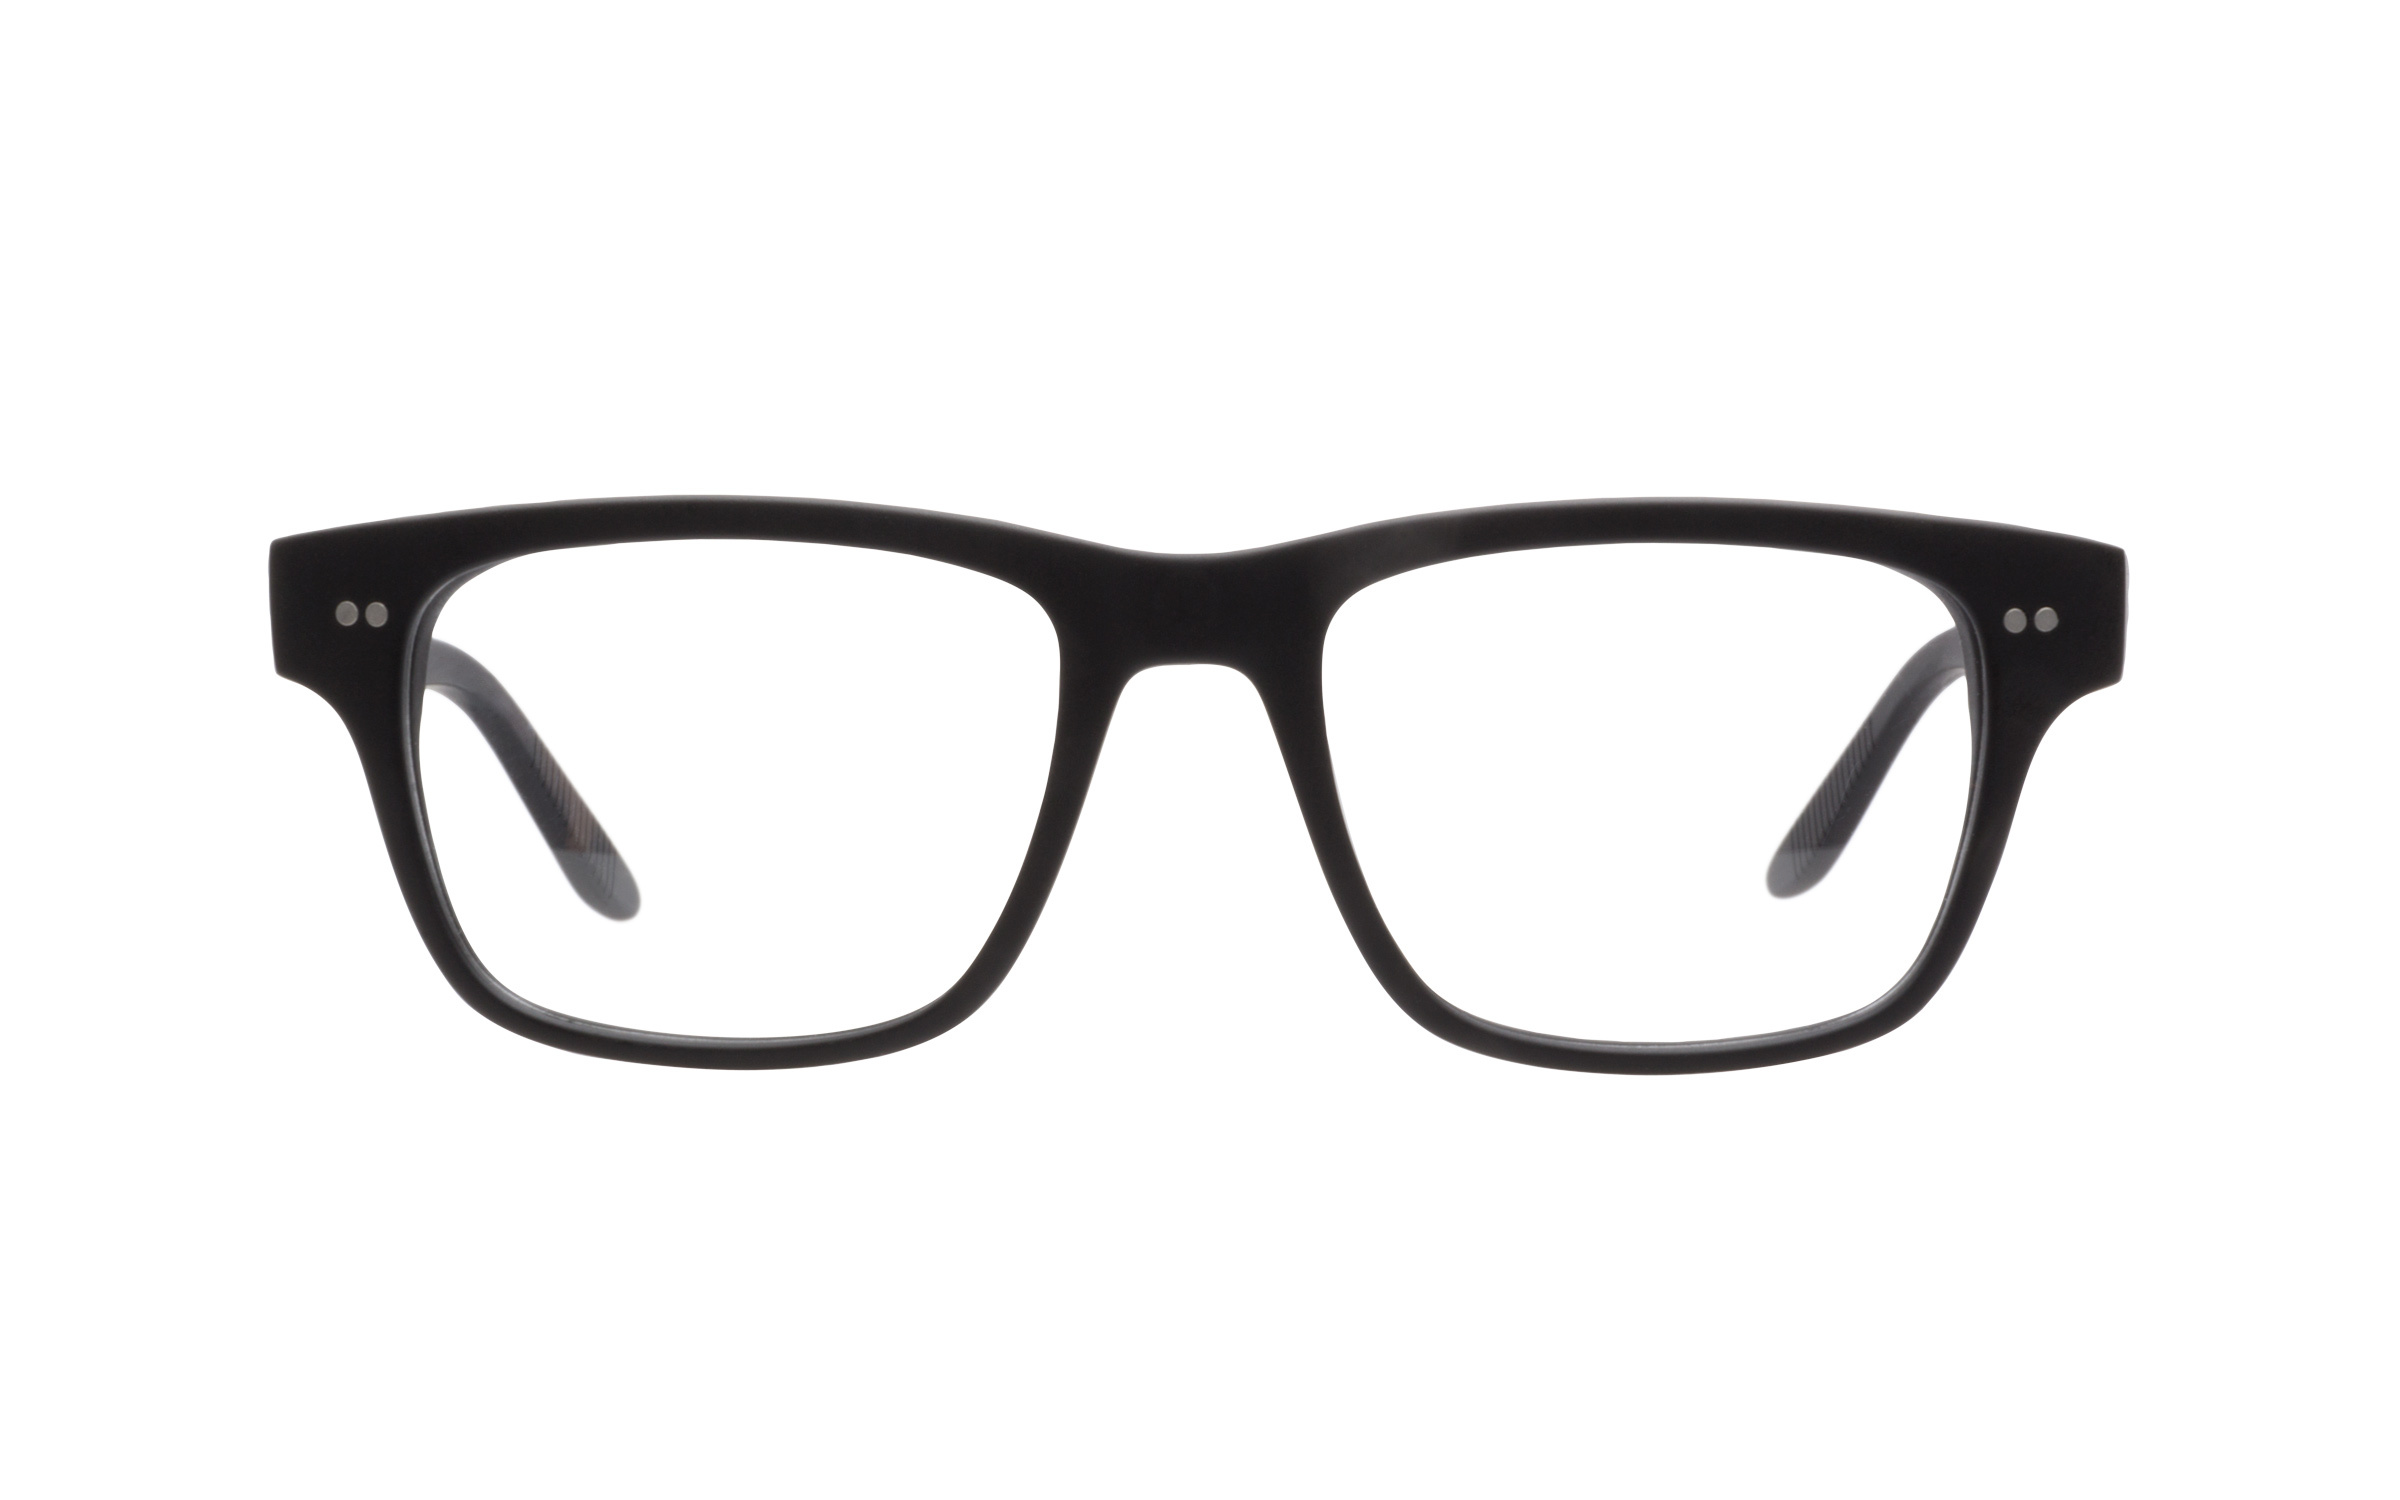 Mens_Rectangular_Glasses_Black_Joseph_Marc_Online_Coastal